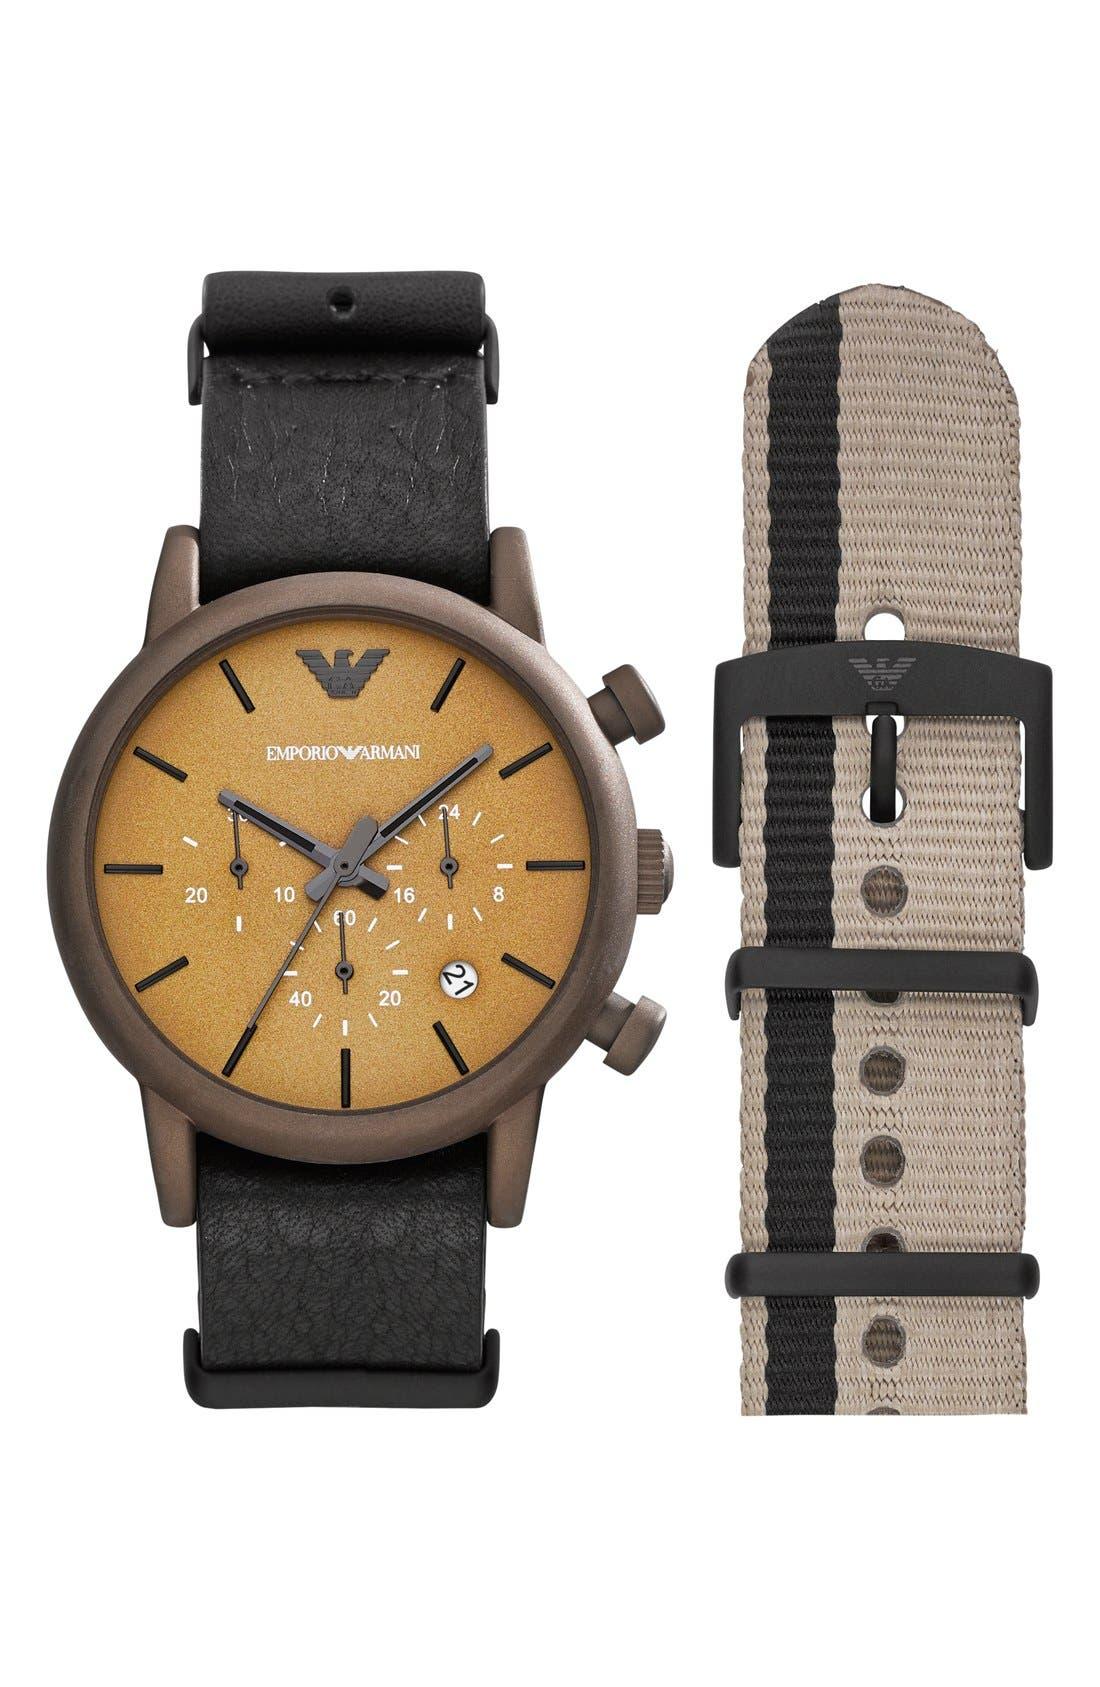 Main Image - Emporio Armani Chronograph Watch & Interchangeable Strap Set, 41mm